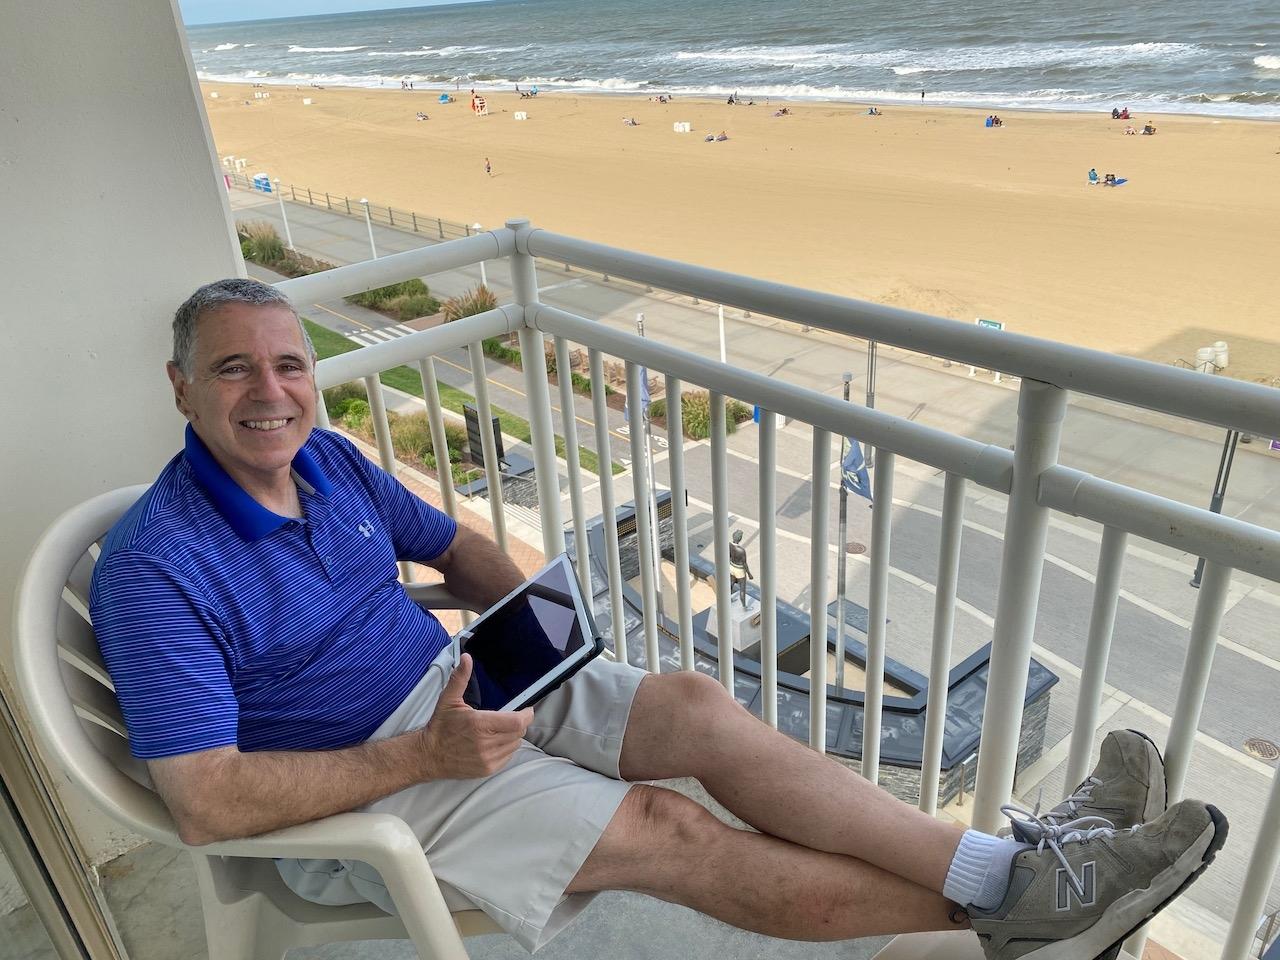 A couple days in VA Beach